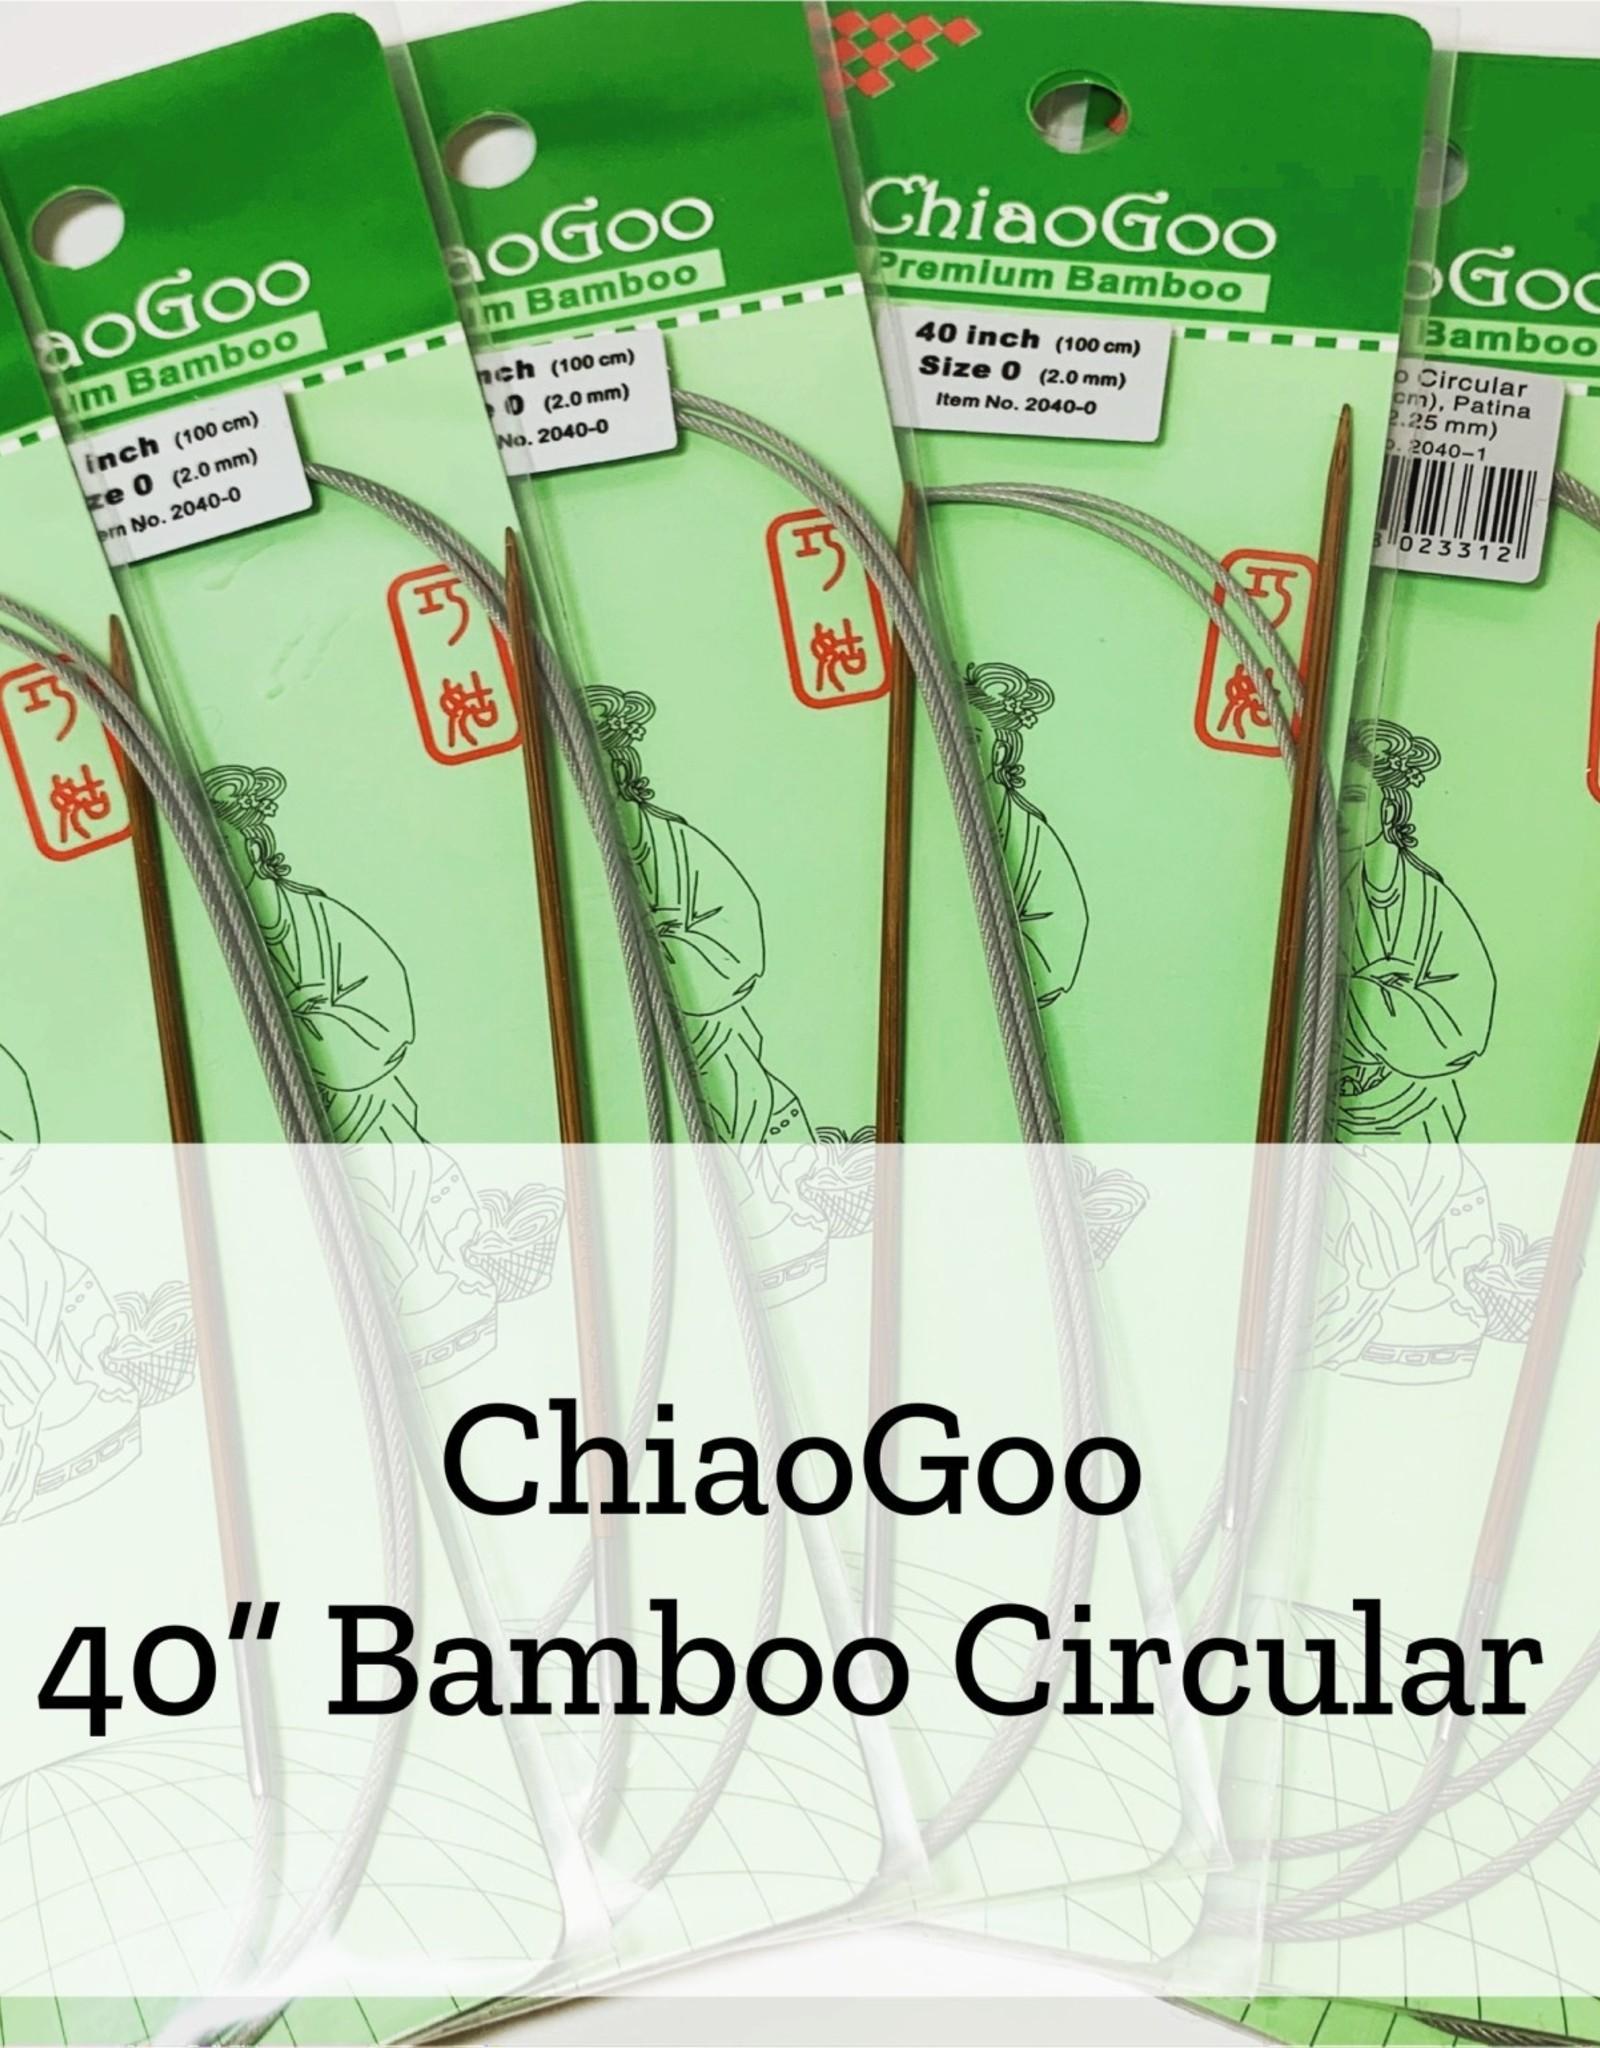 "ChiaoGoo Bam 40"" 4.5 mm"